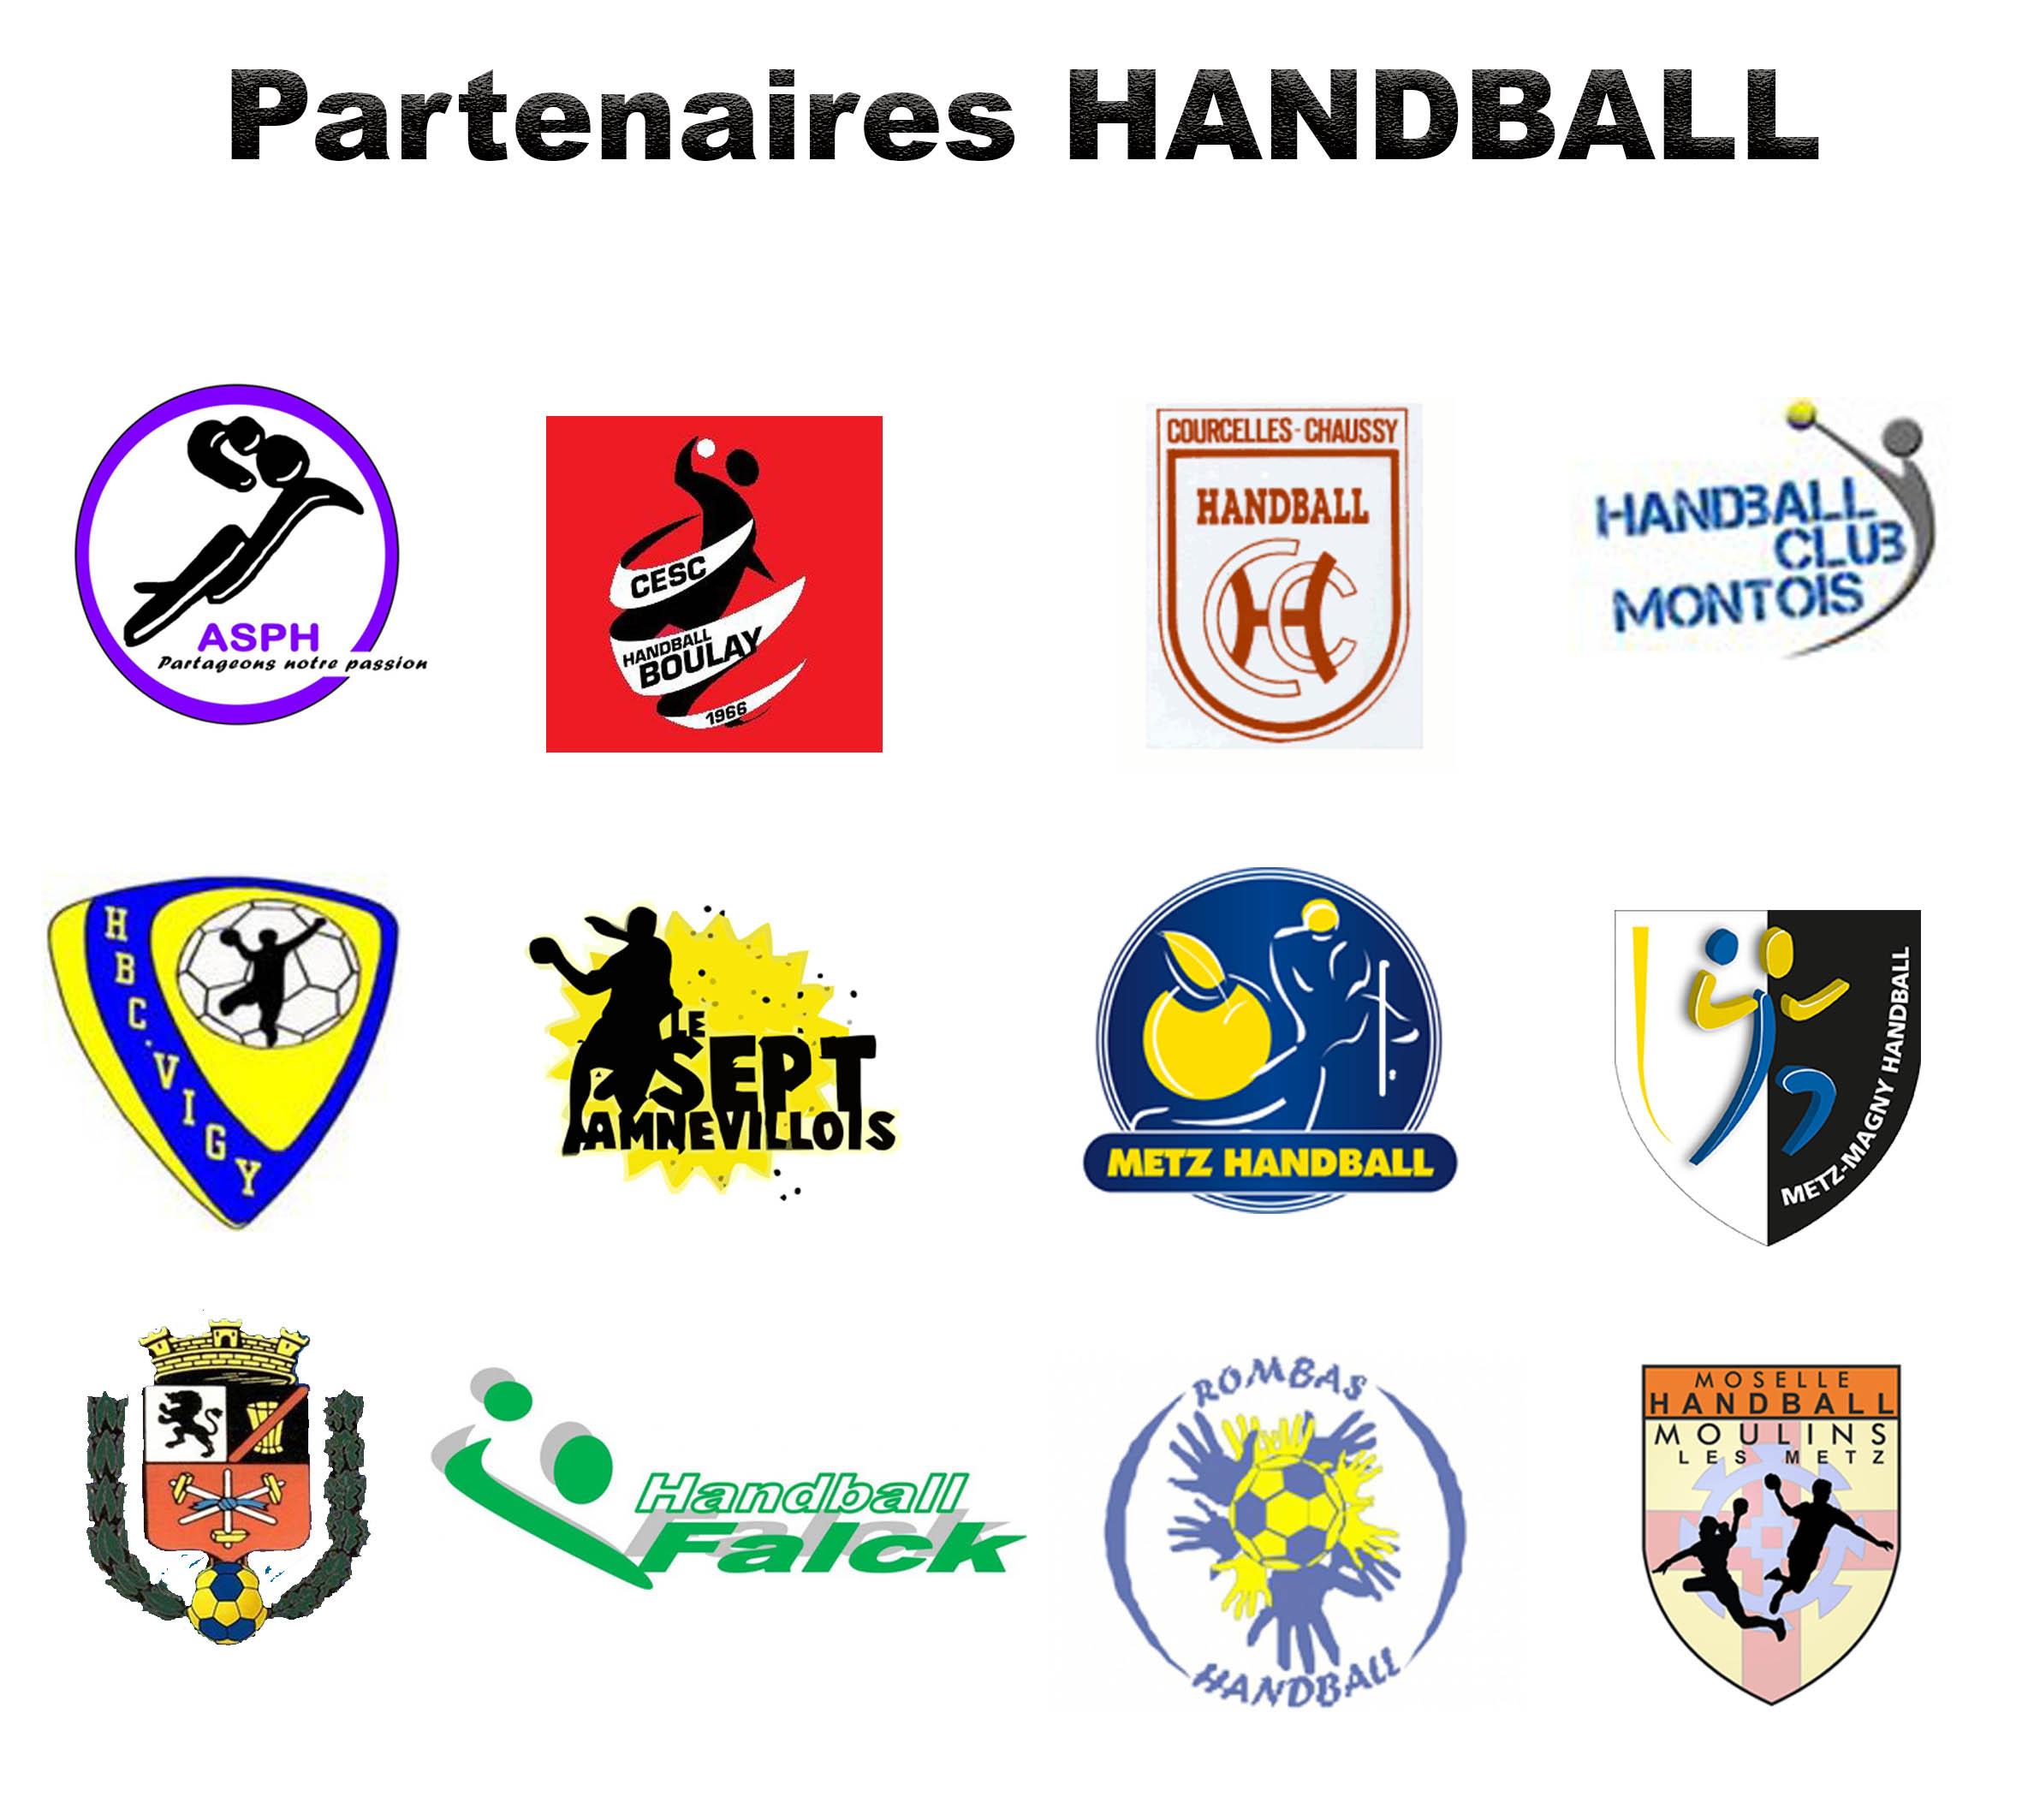 Handball parte